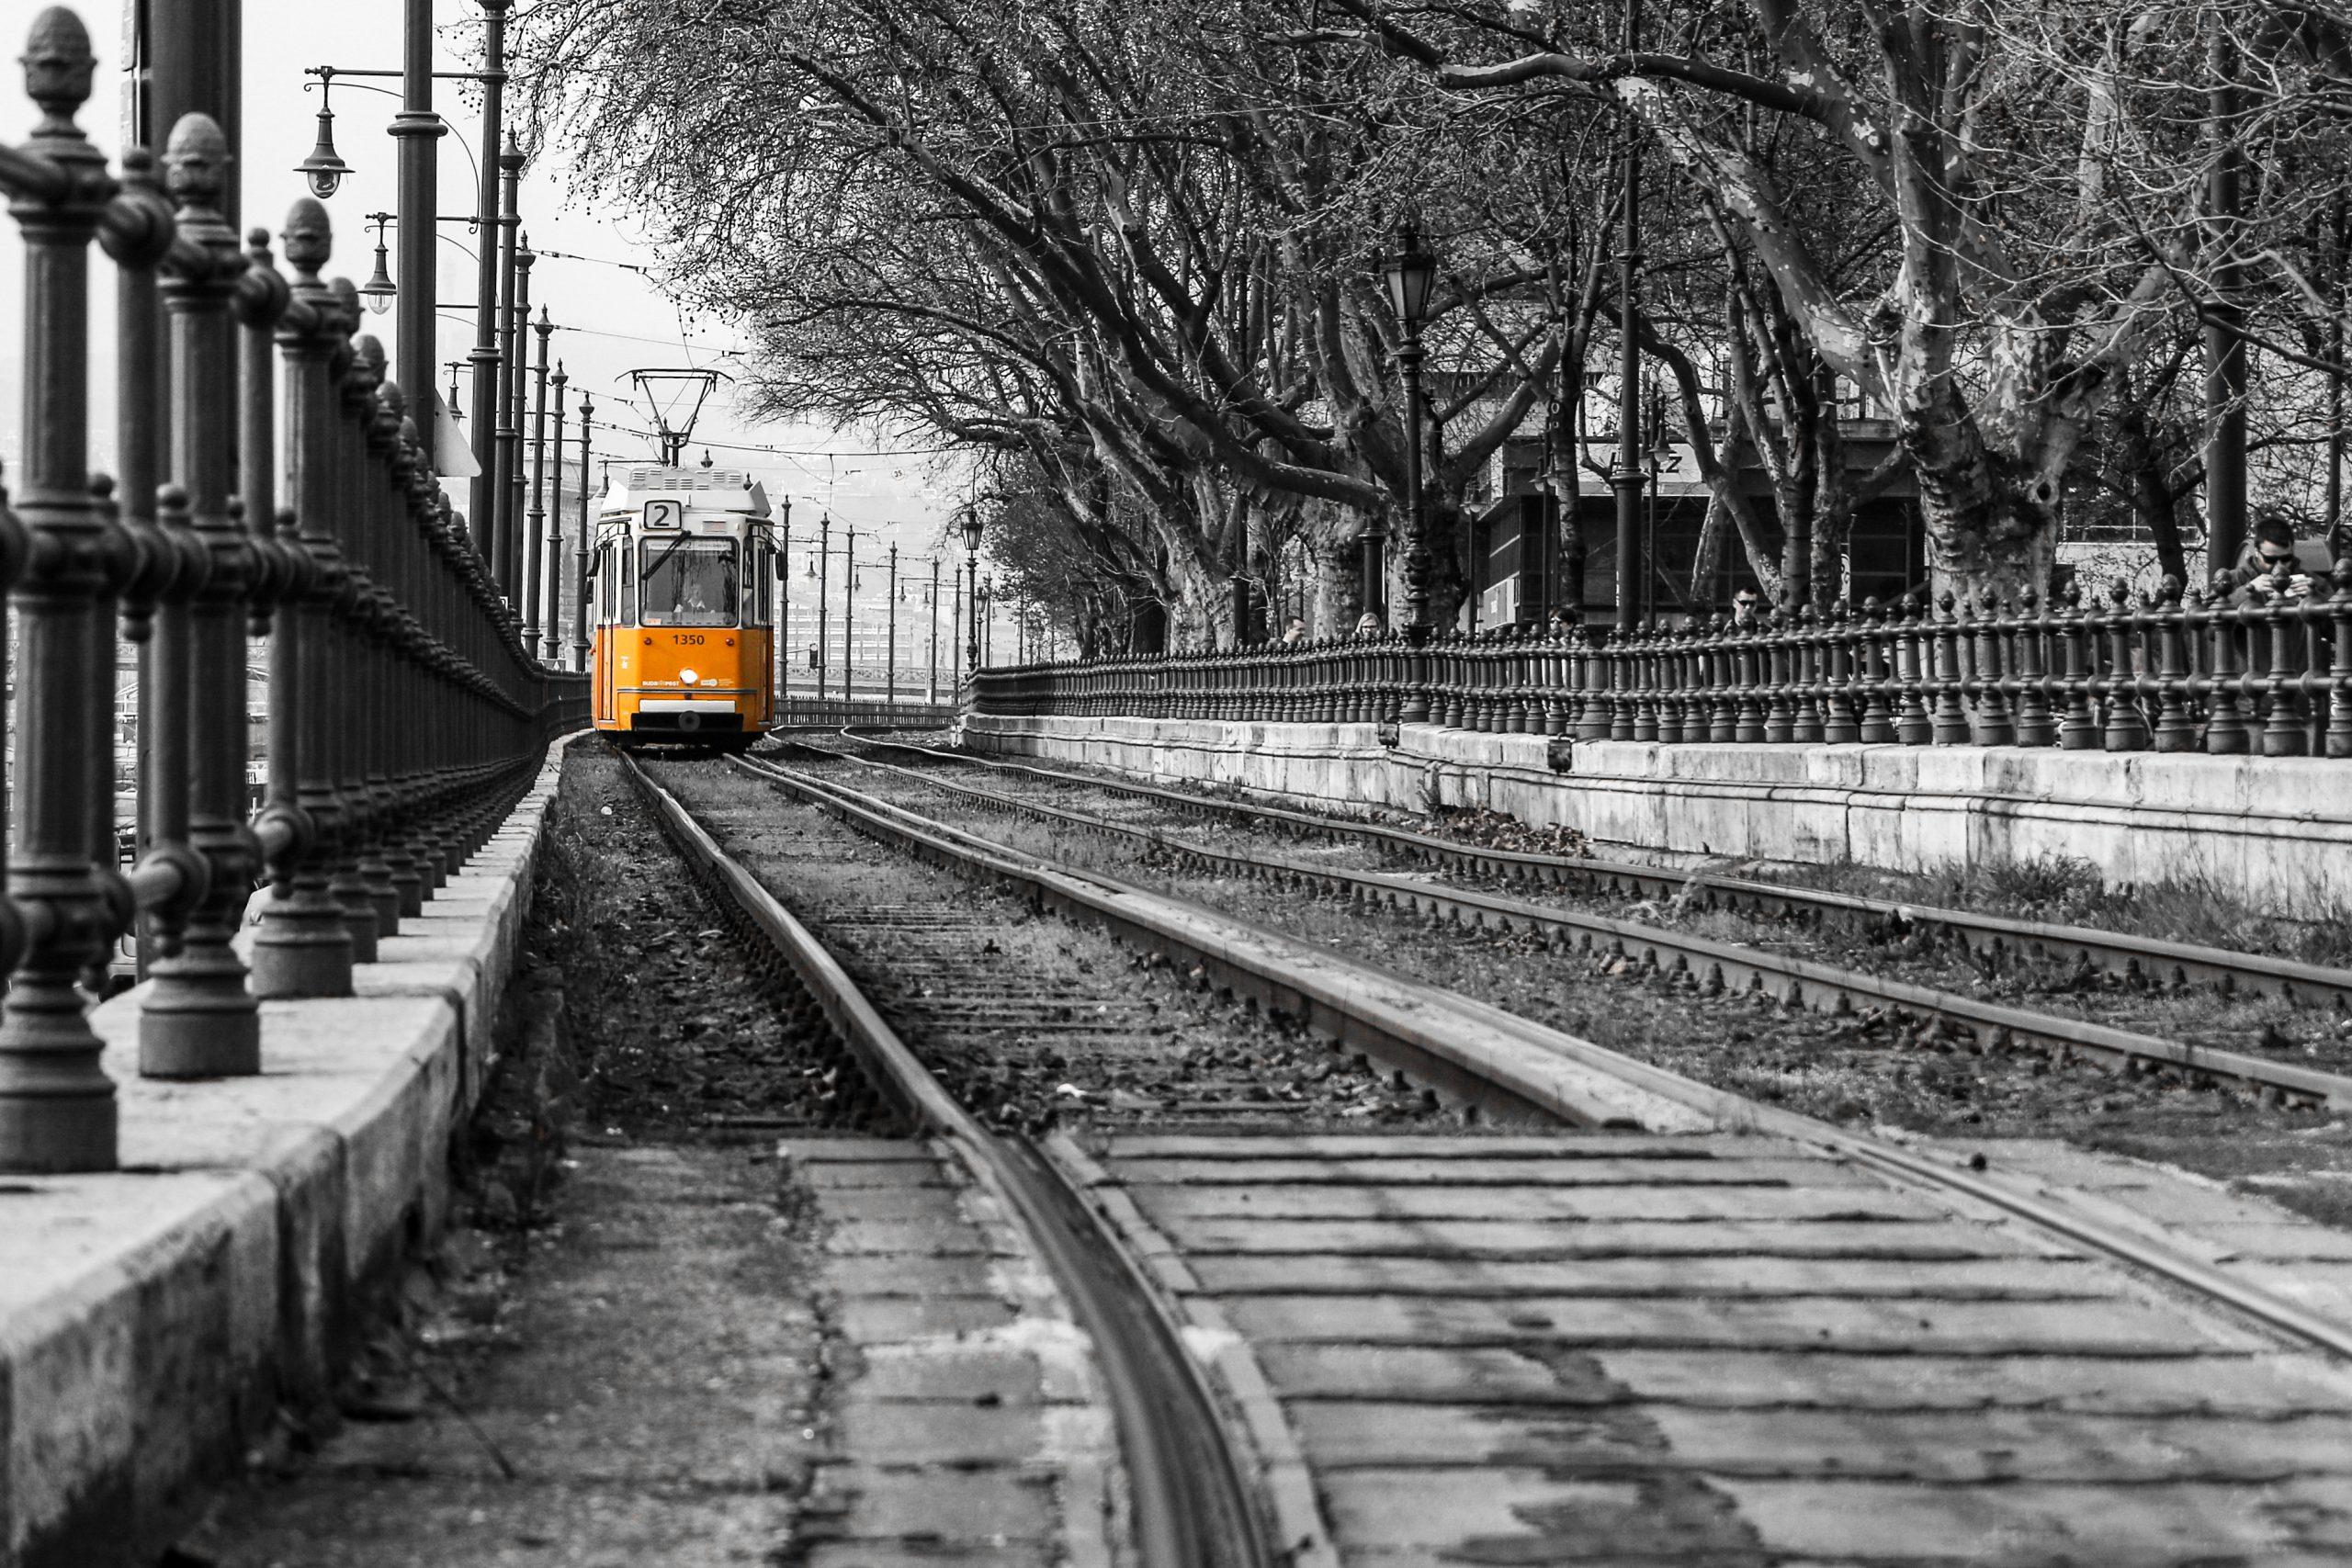 rmda-ss-backround92-transportation-yellow-tram-black-white-background.3778.2519